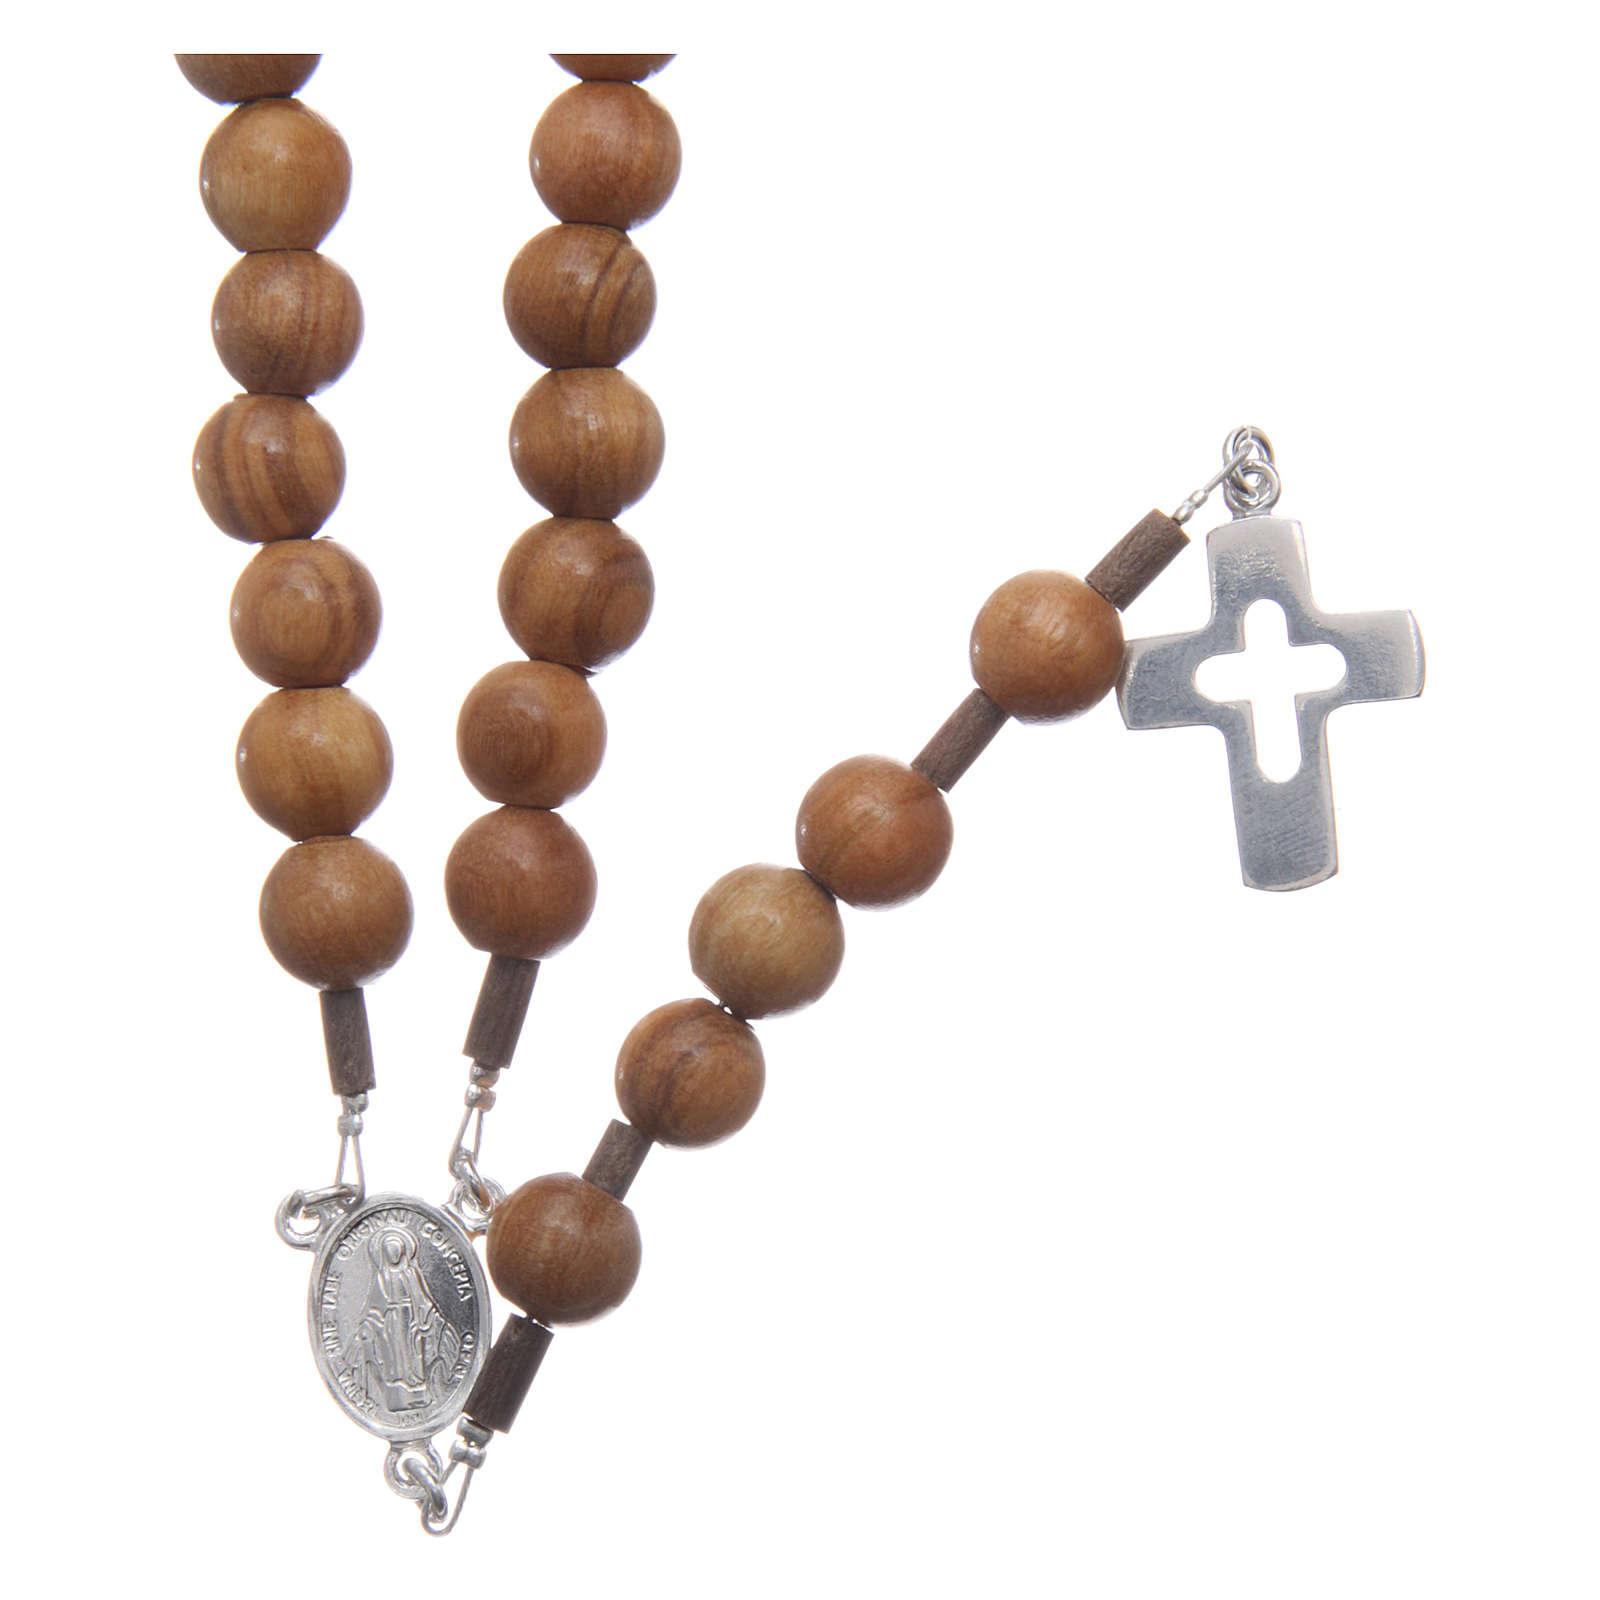 Rosario uomo ulivo croce argento 925 cavetto con catena 4